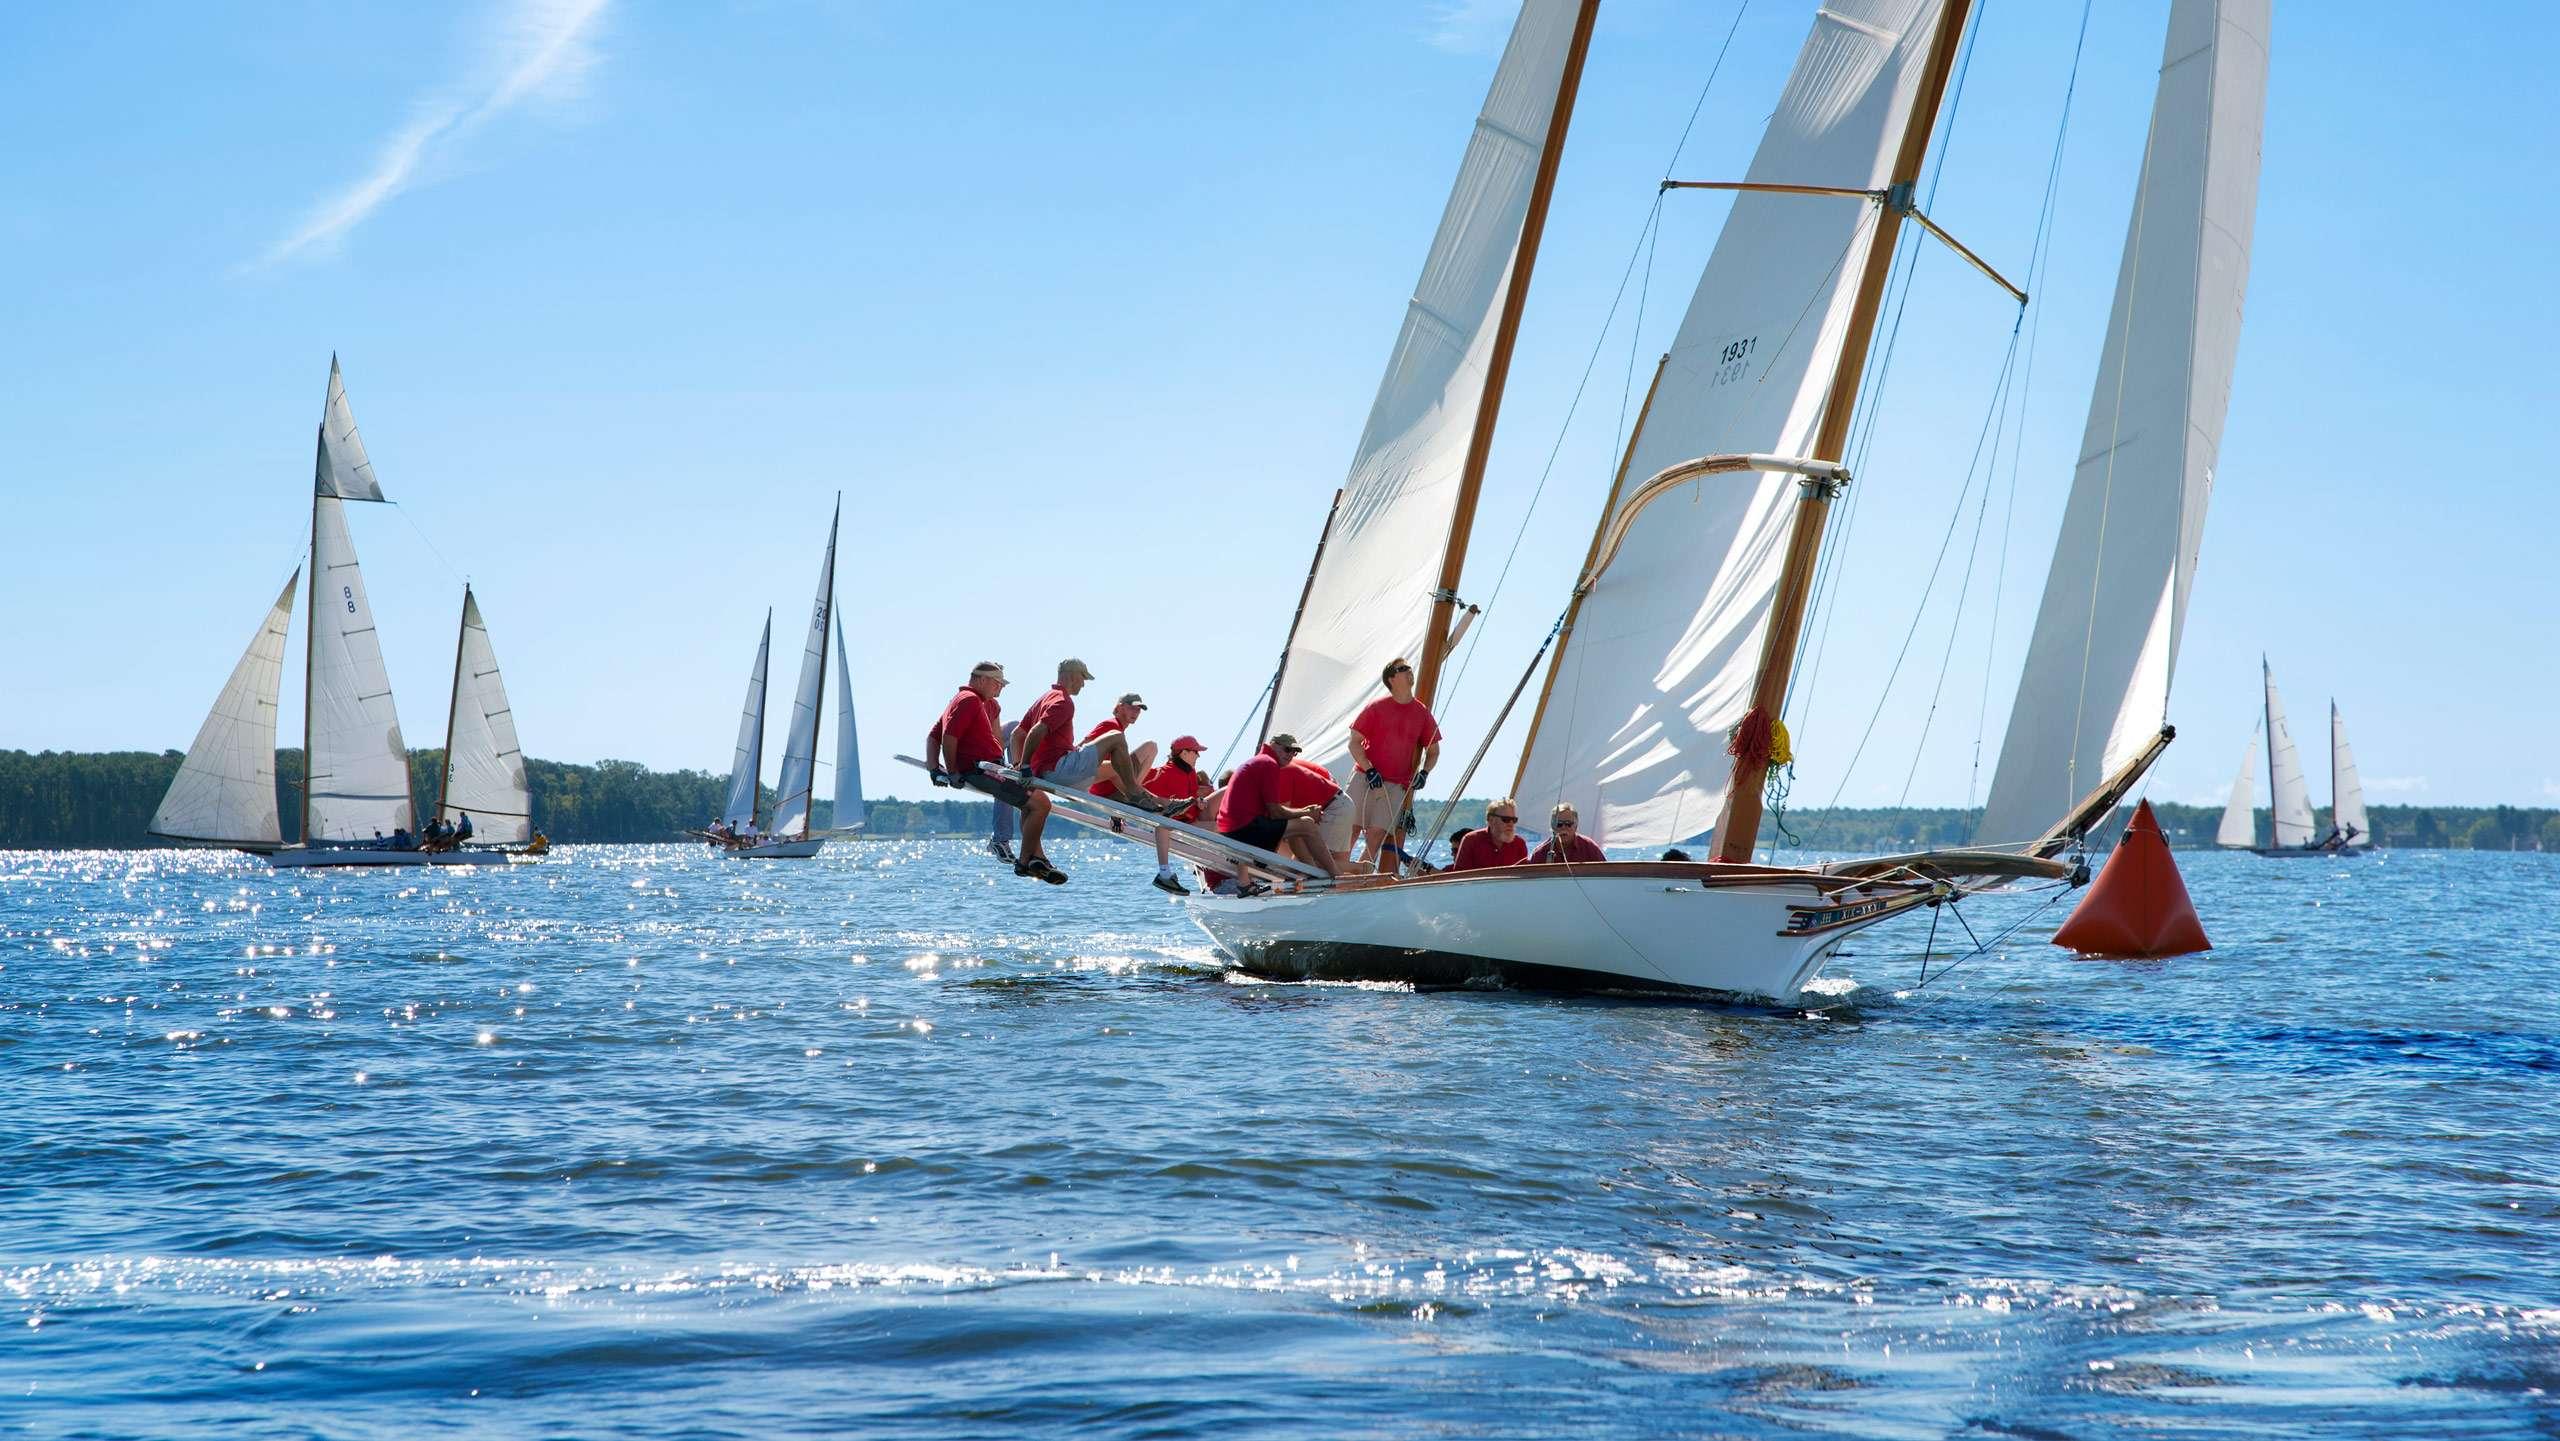 PORTFOLIO - Sailing - Log Canoes #11   PCG557